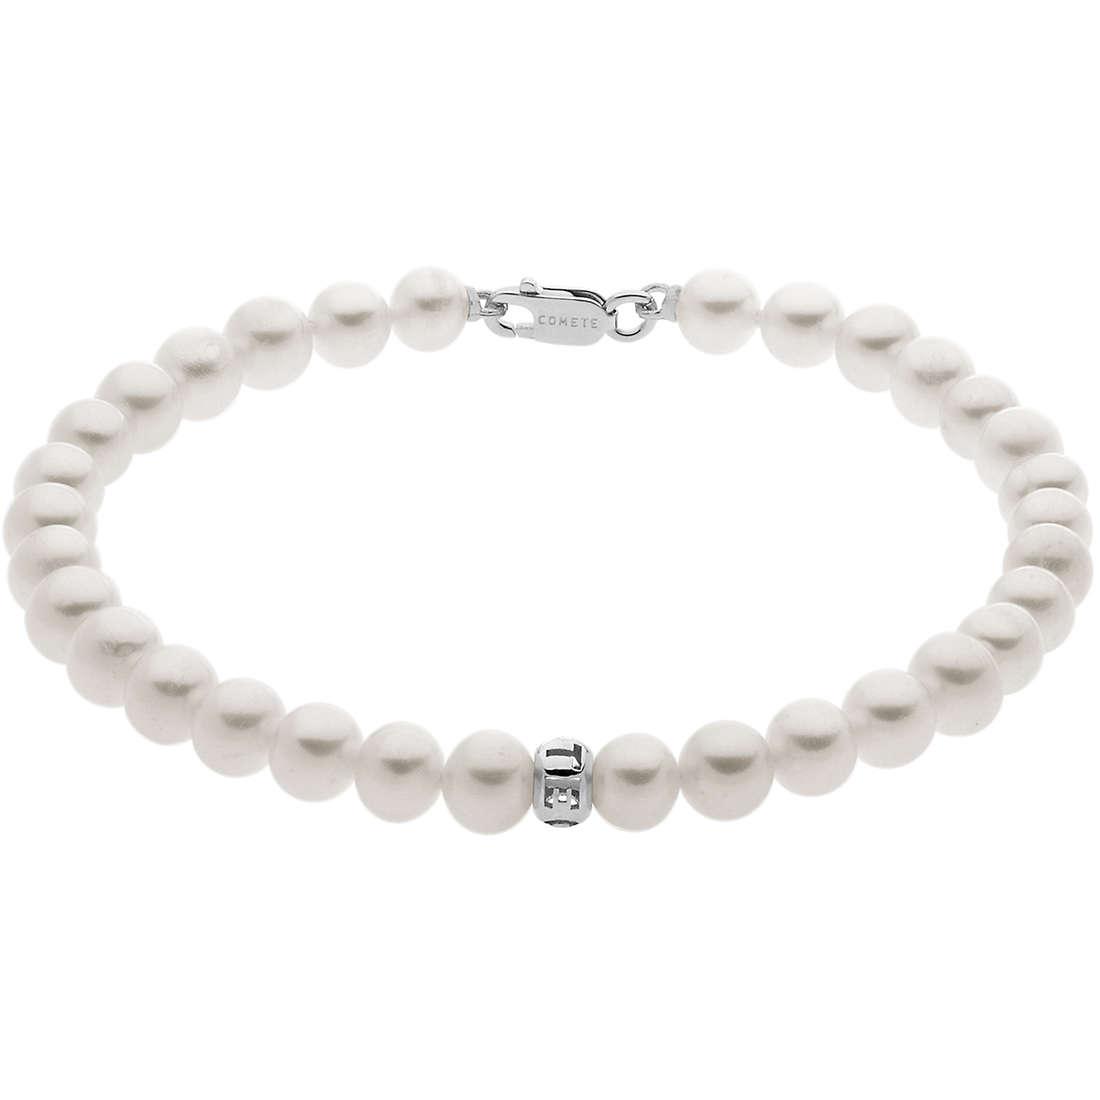 bracelet woman jewellery Comete Fantasie di perle BRQ 250 B